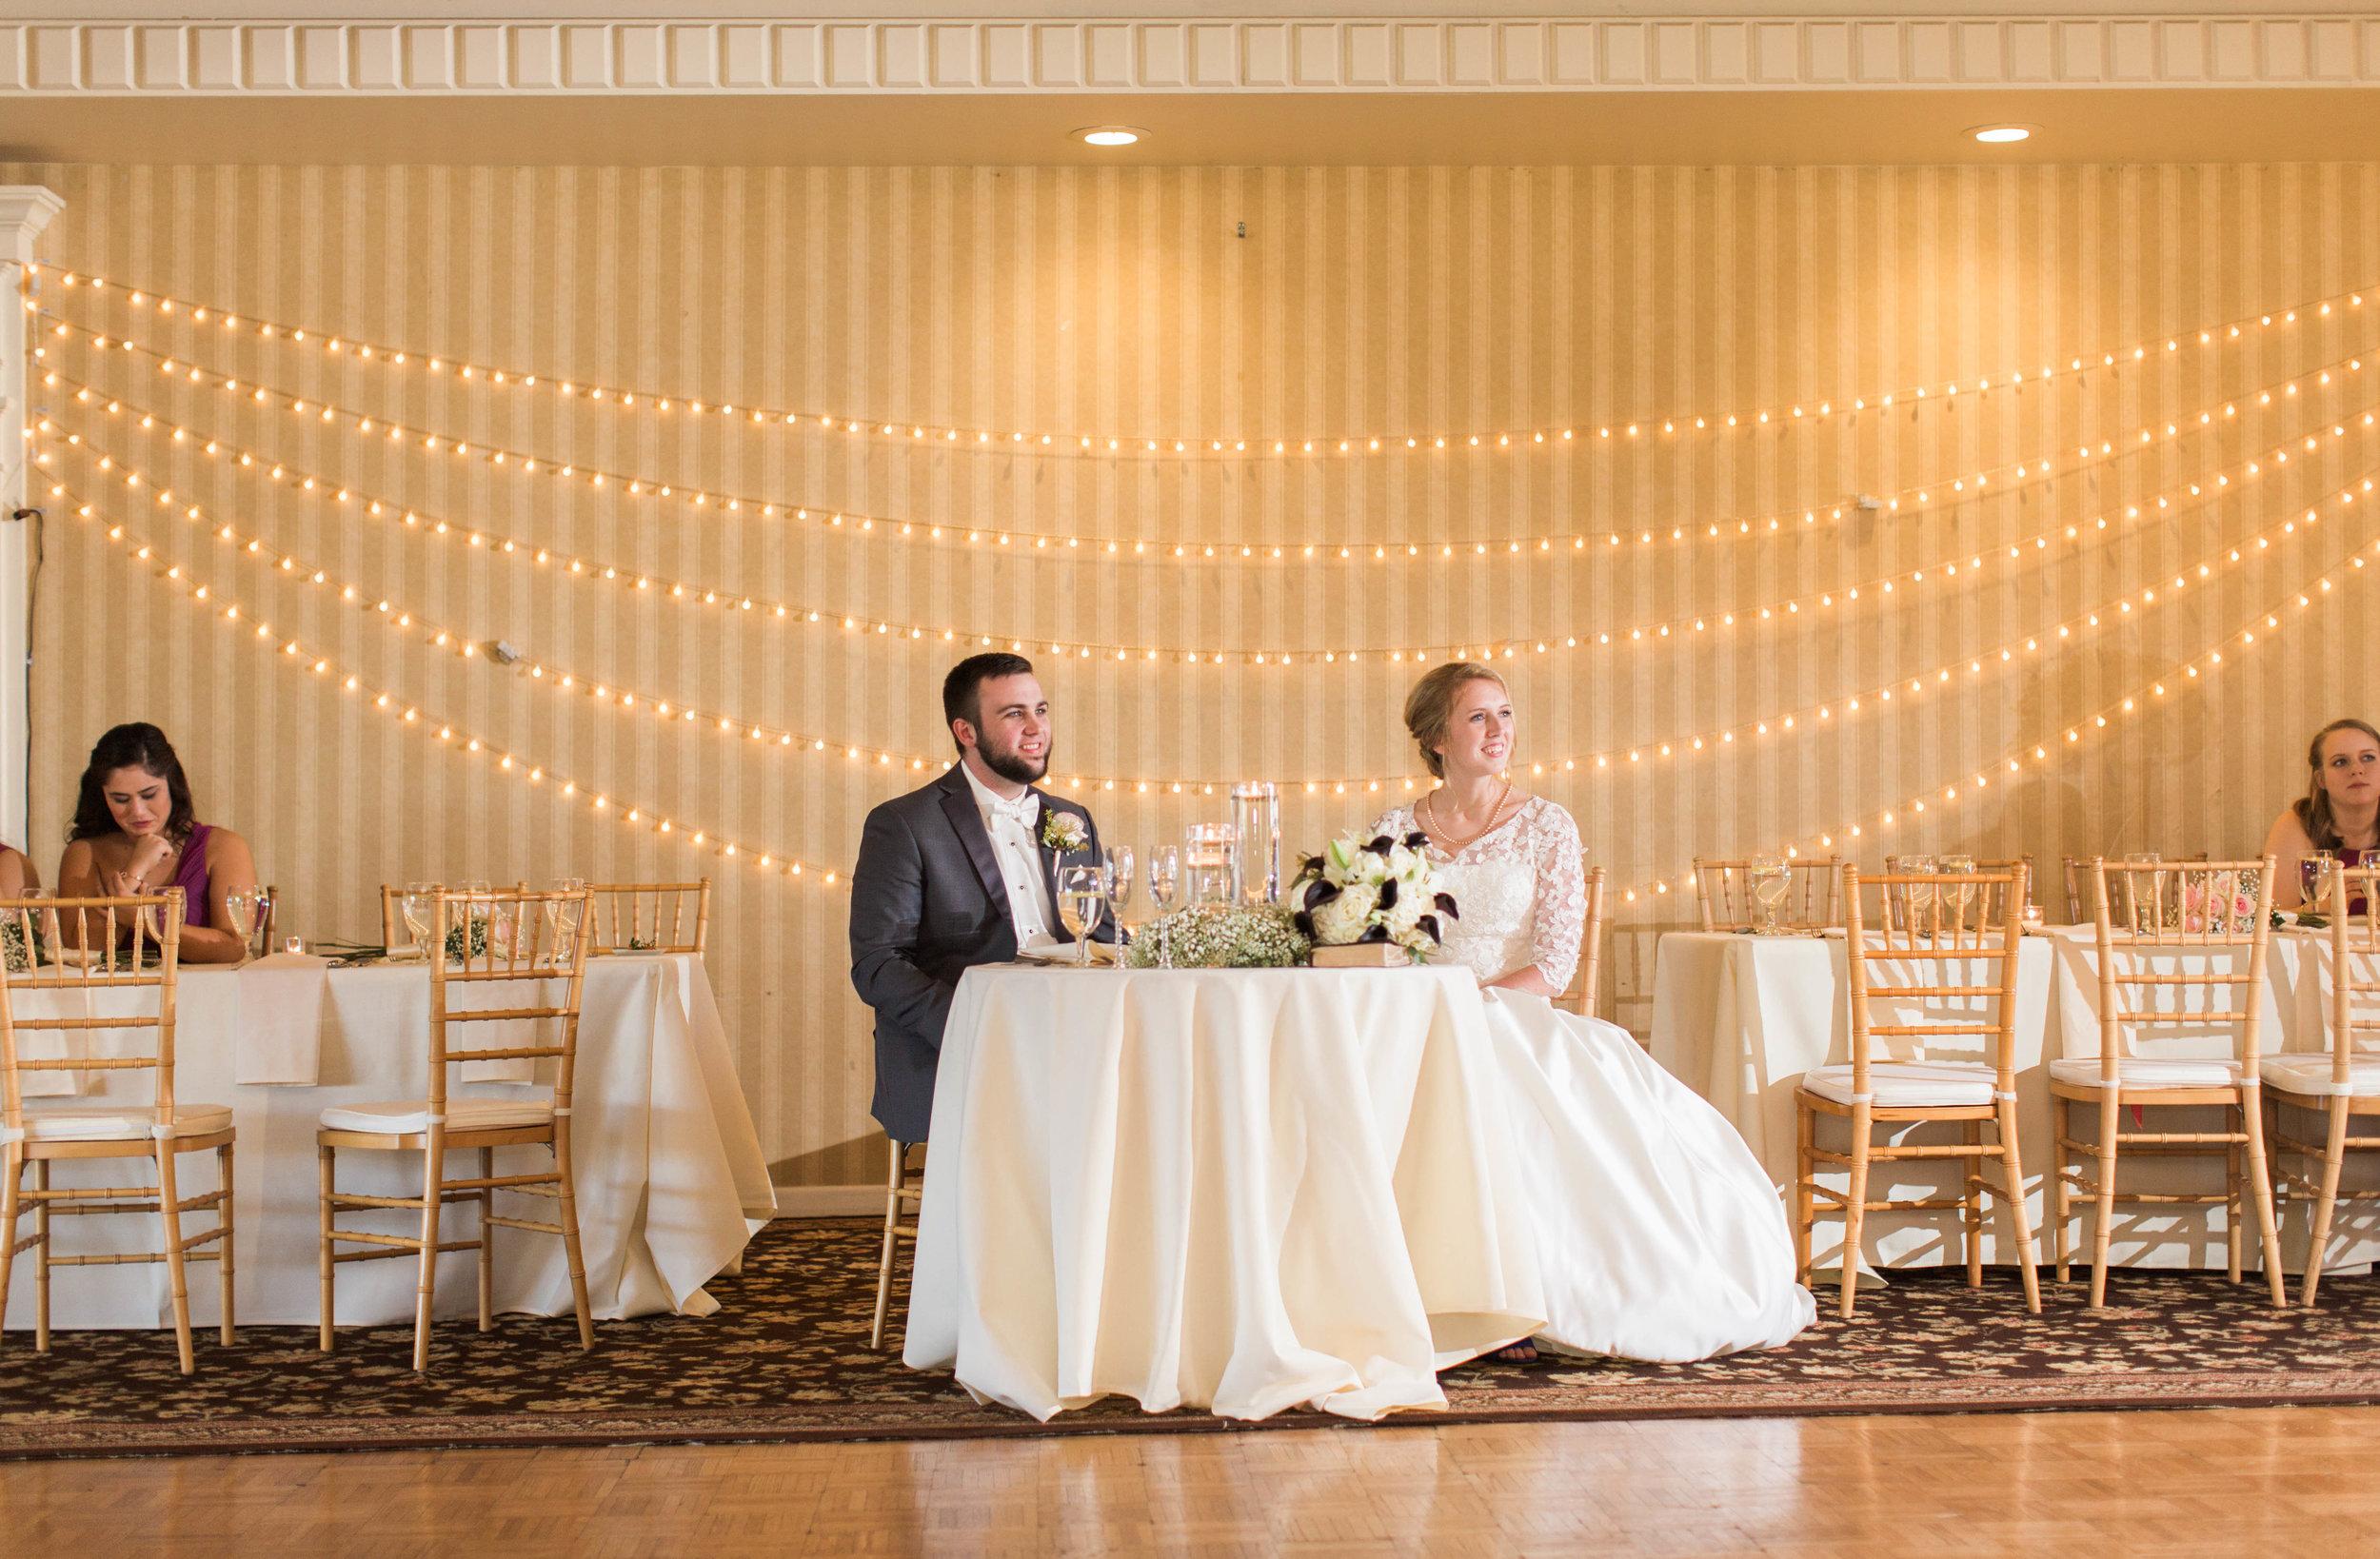 Beaumont Texas Country Club wedding-6122.jpg